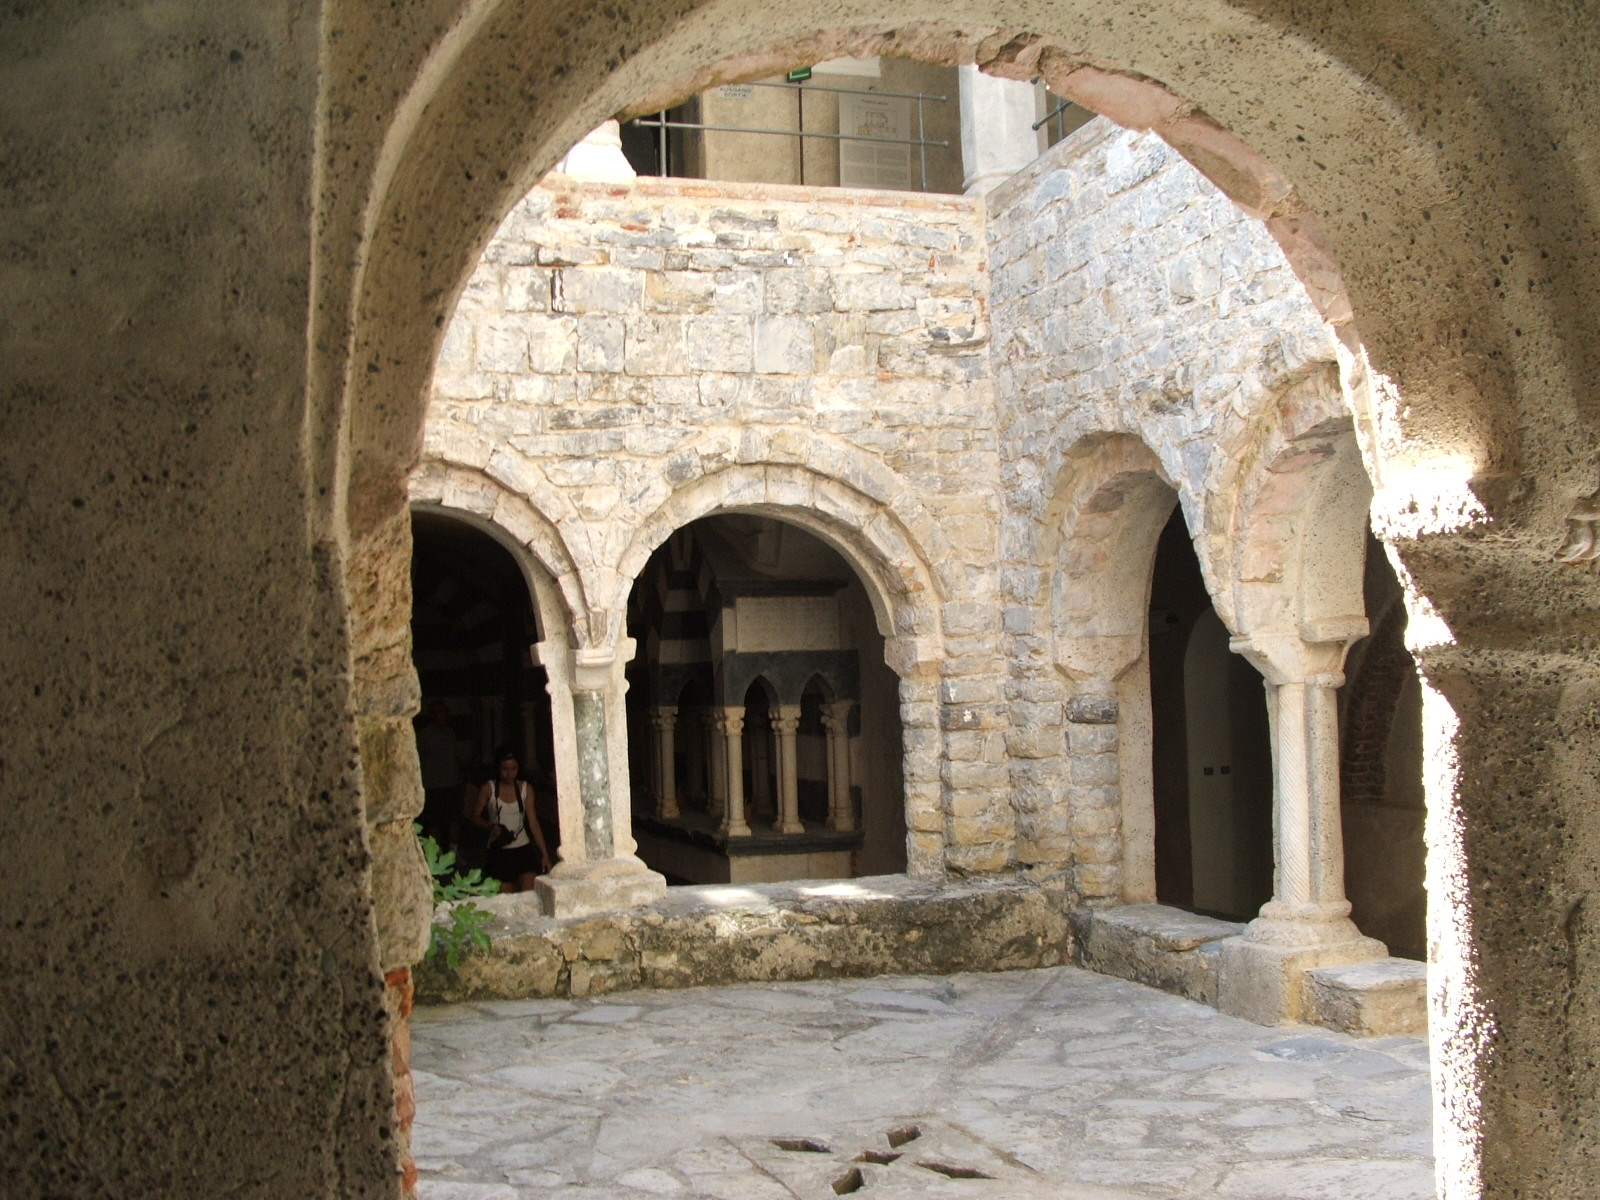 abbazia-di-san-fruttuoso-di-camogli-dscf0711